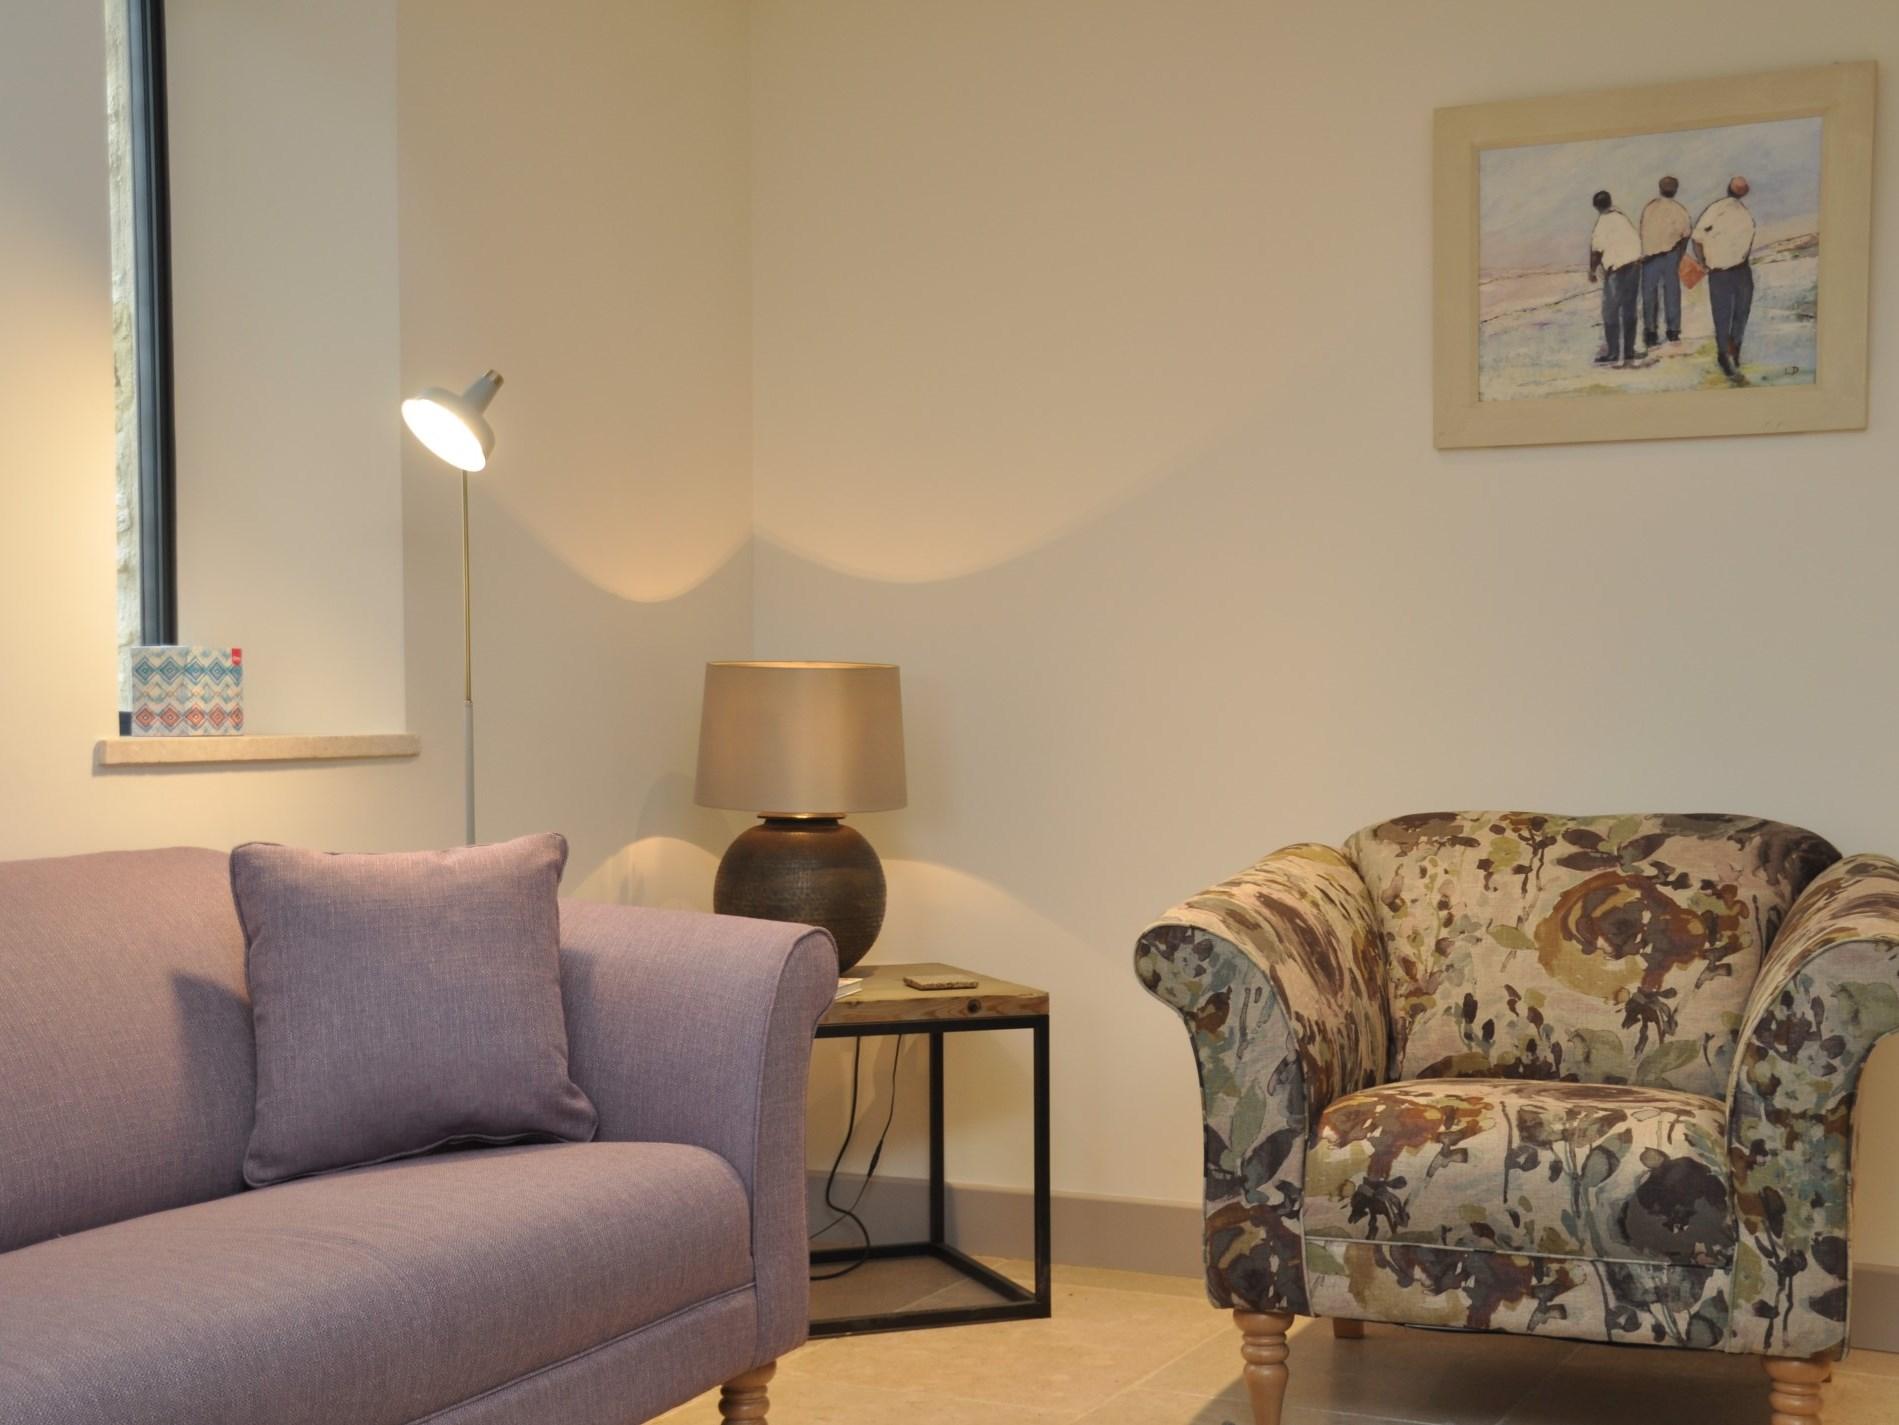 Tasteful soft furnishings and artwork